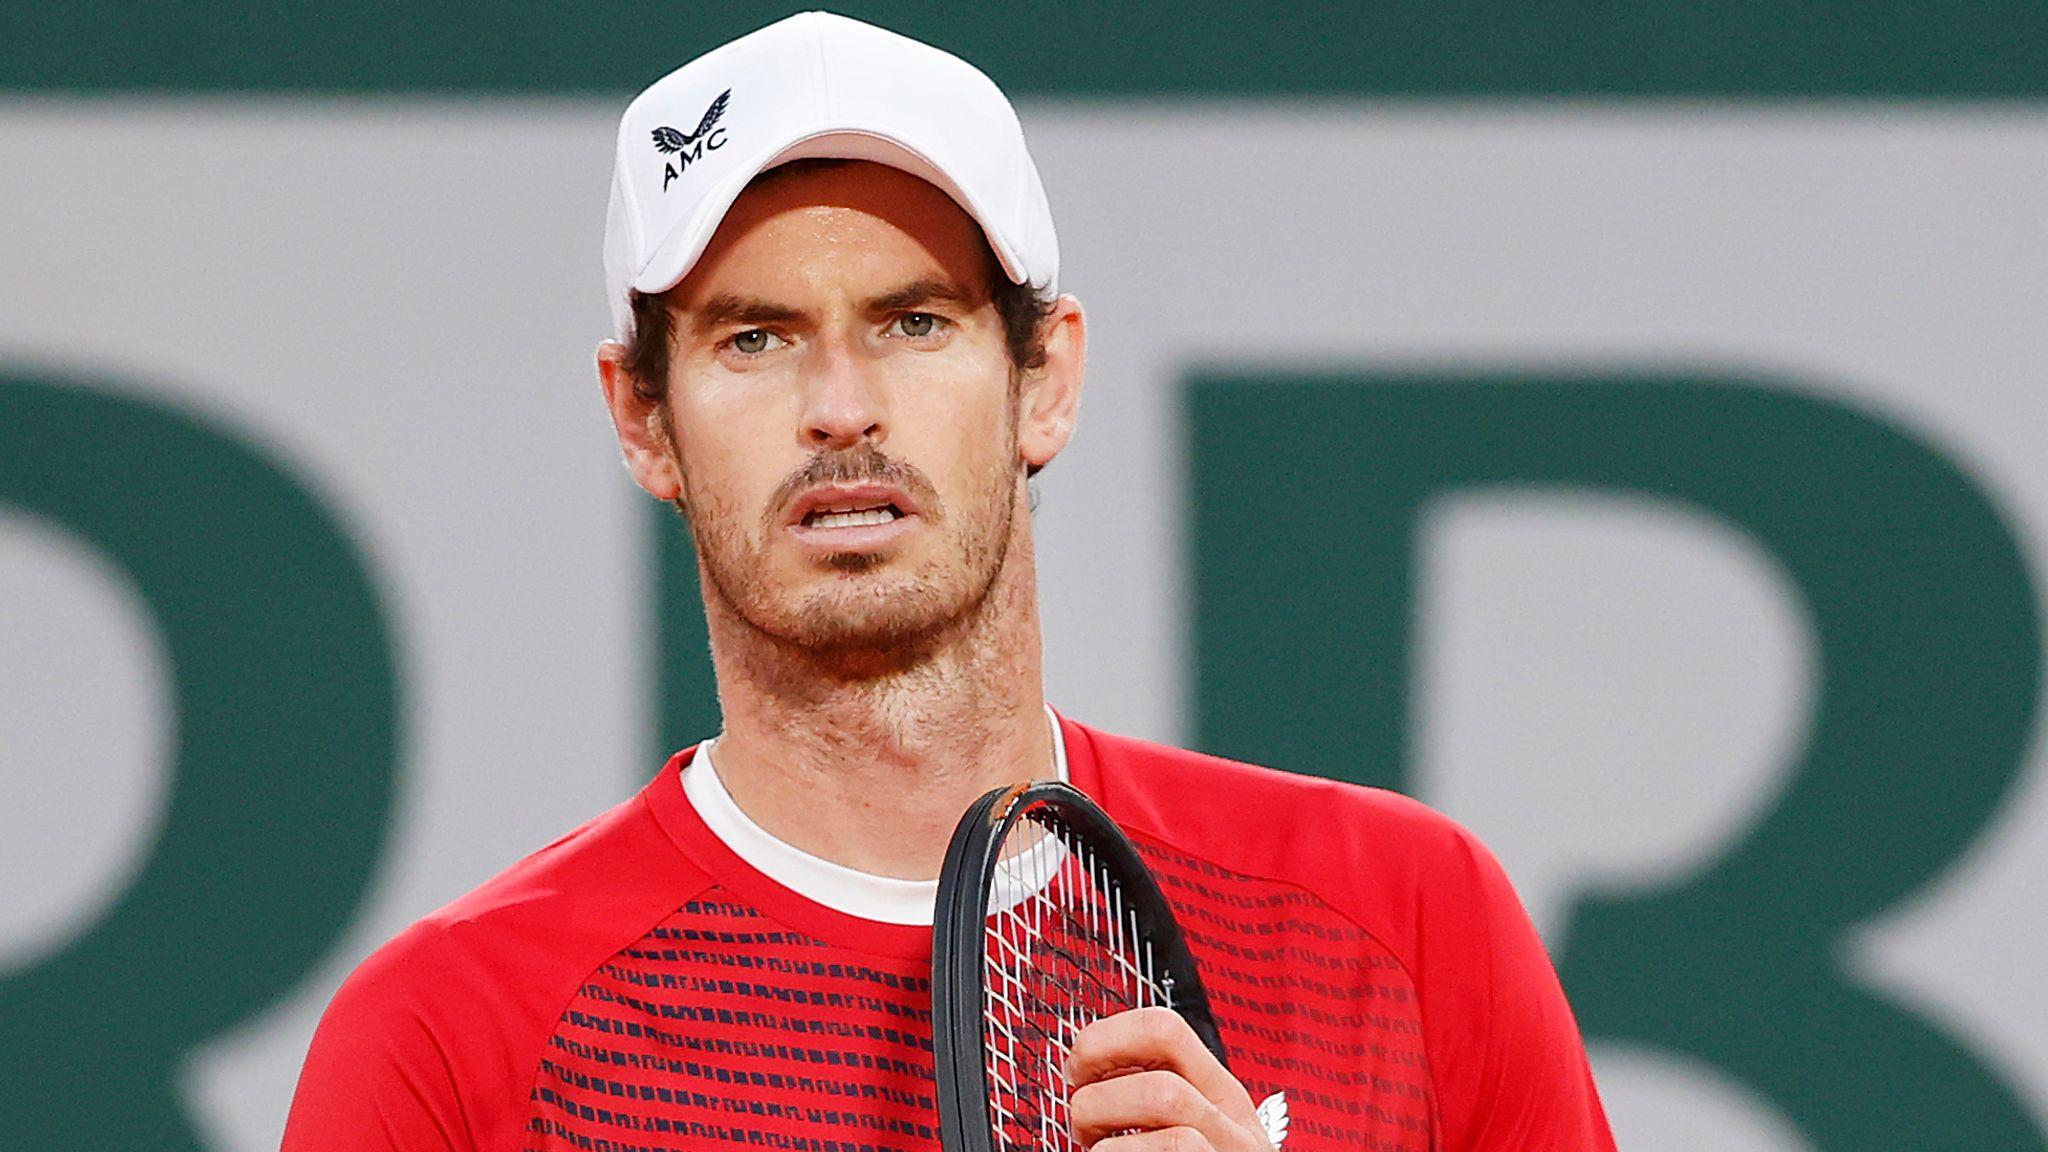 Andy Murray Foto www.skysports - Andy Murray izbran v britansko ekipo za OI v Tokiu